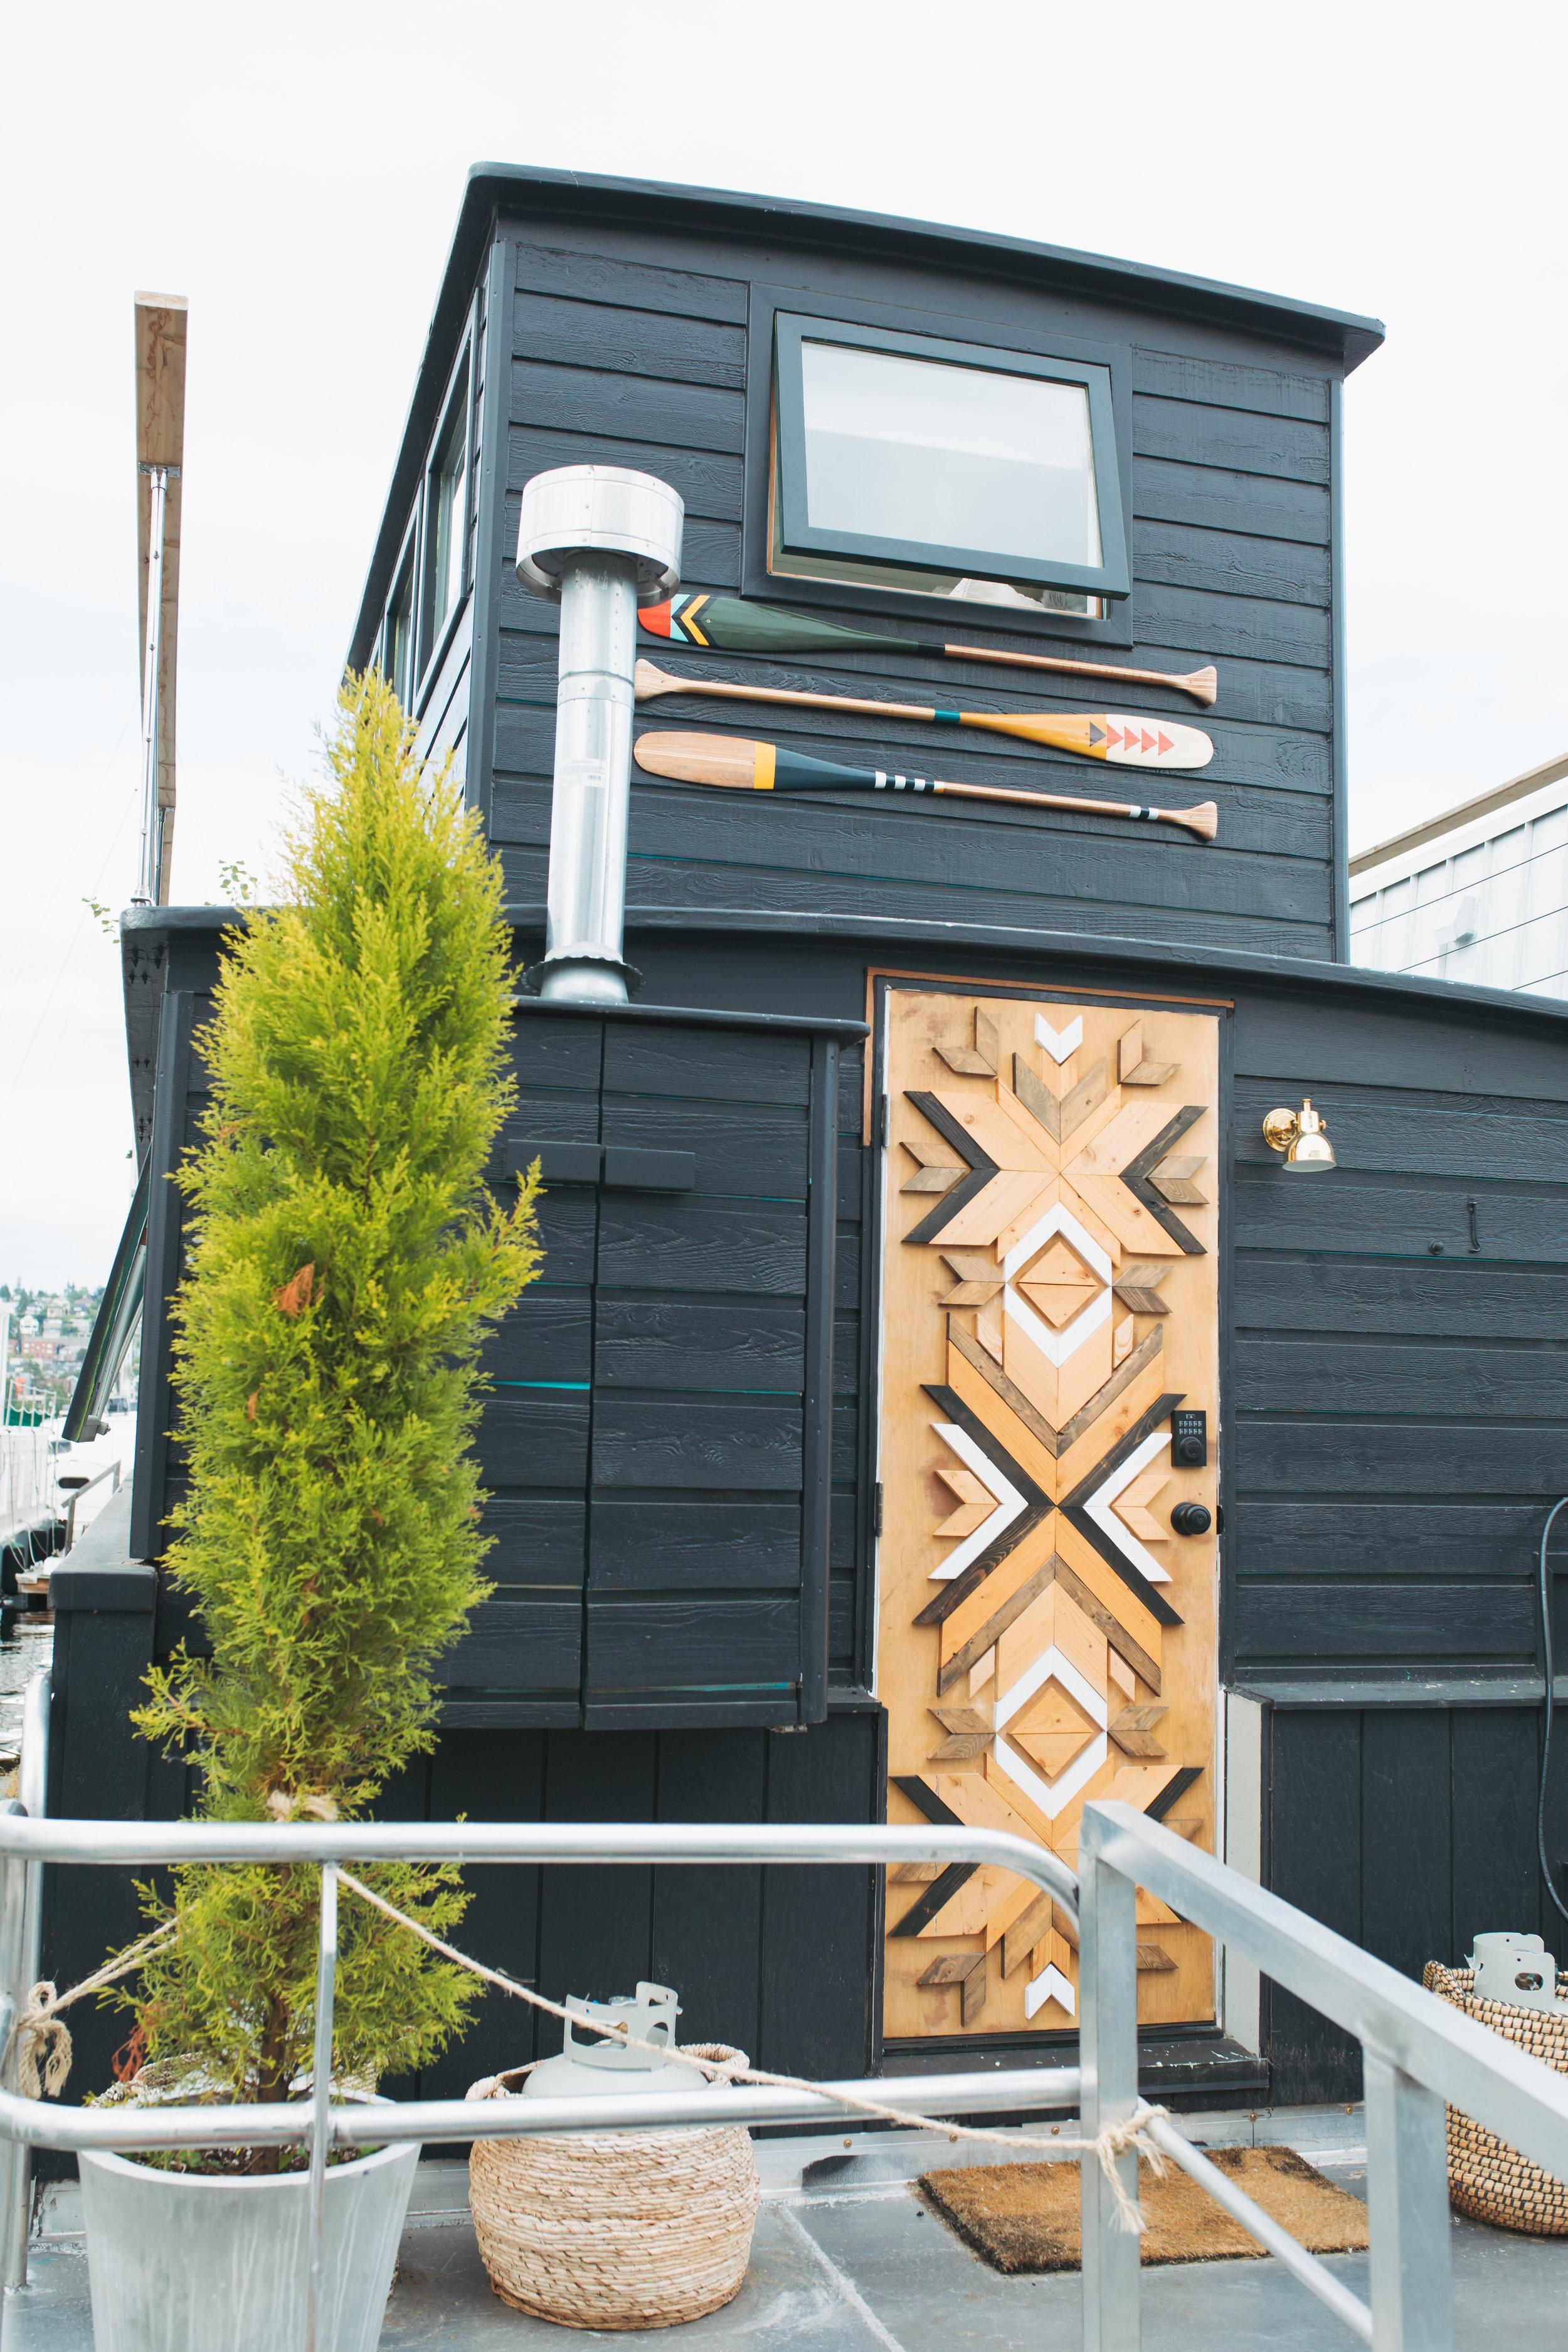 katherine_mendieta_seattle_lakeside_lovenest_houseboat-44.jpg